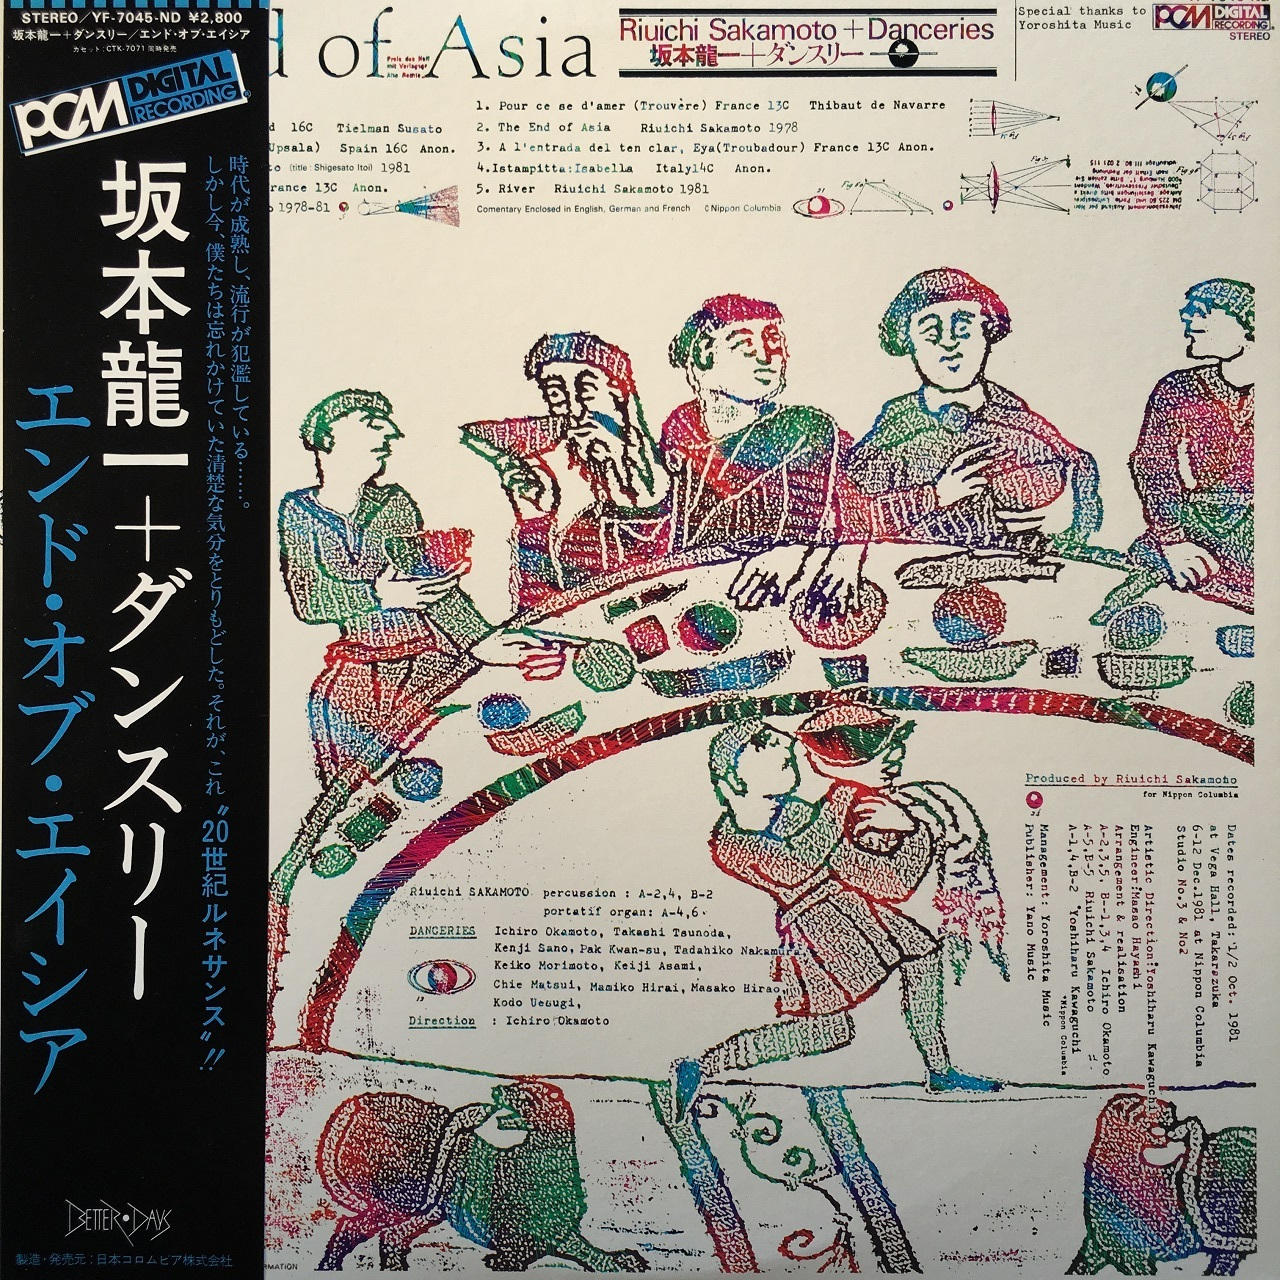 【LP・国内盤】坂本龍一 +  ダンスリー / エンド・オブ・エイジア